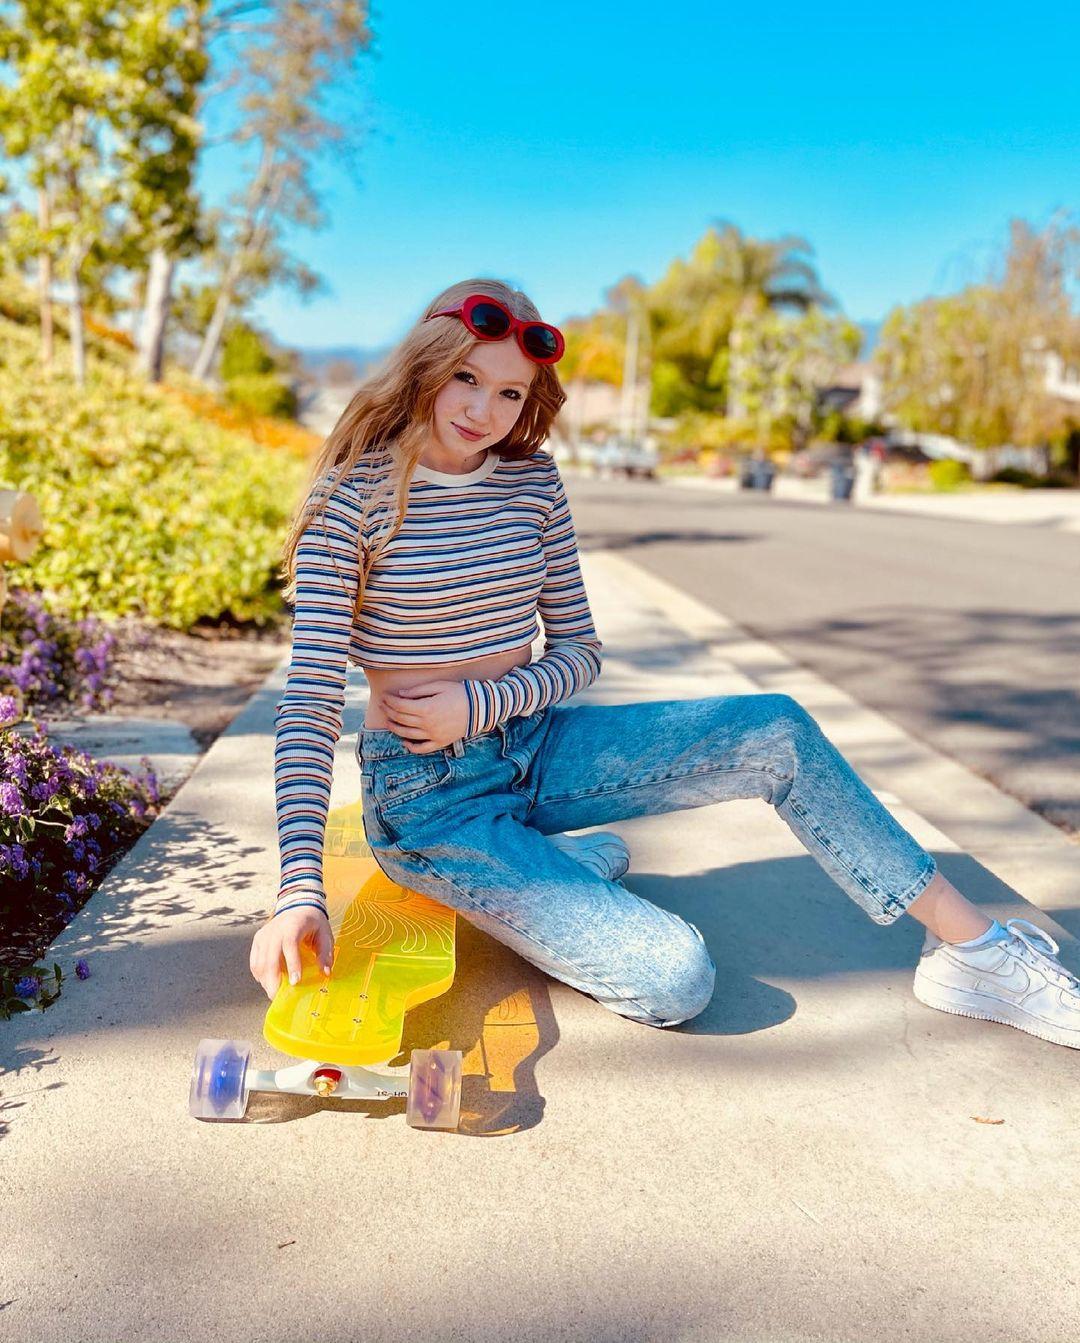 Abigail-Zoe-Lewis-Wallpapers-Insta-Fit-Bio-5